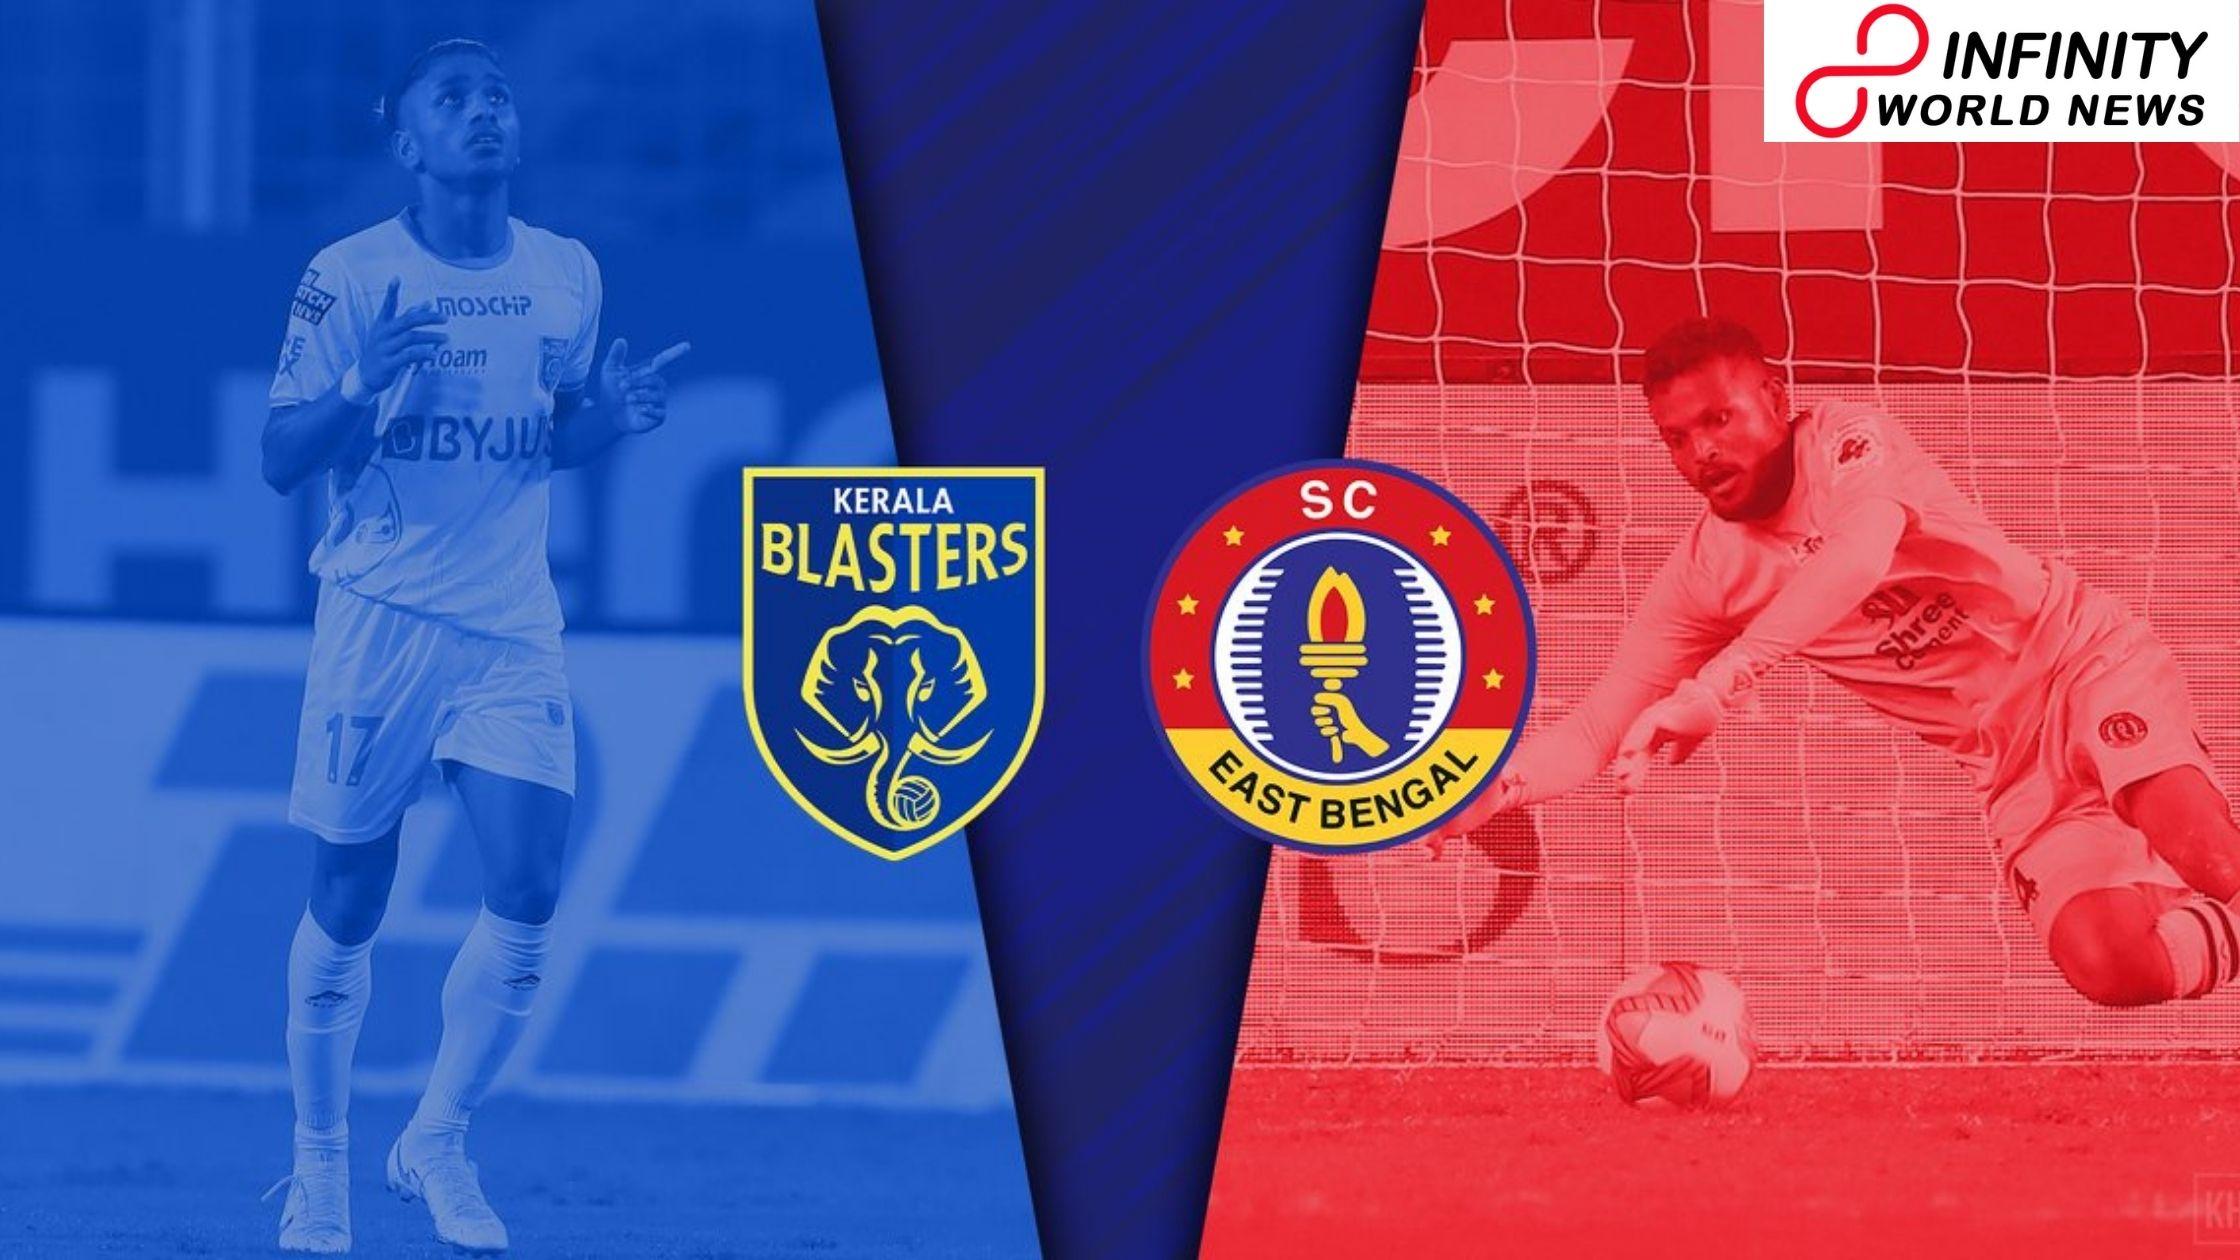 ISL 2020-21: Kerala Blasters plus SC East Bengal Seek First Win into Impact of Strugglers